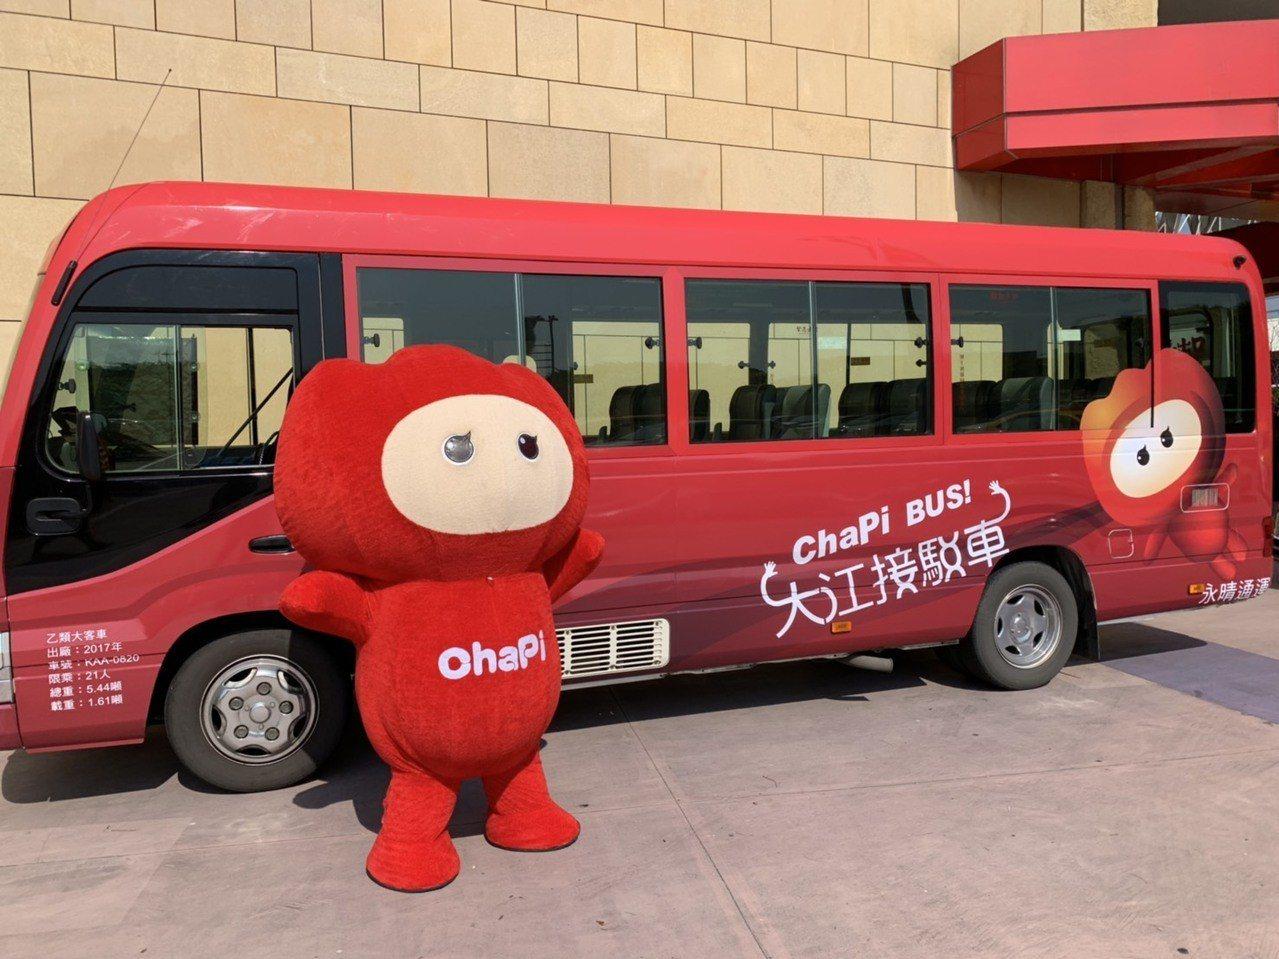 ChaPi BUS大江接駁車I換新裝很有春節年味。圖/大江國際購物中心提供